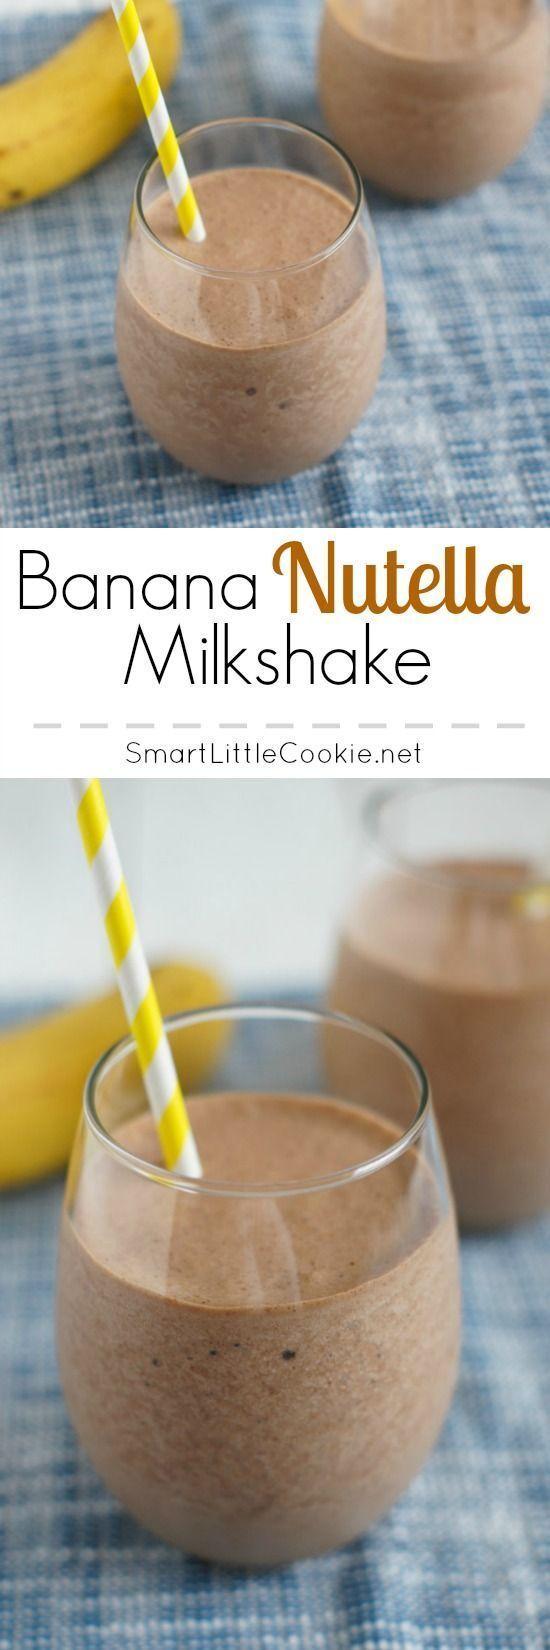 Banana Nutella Milkshake   SmartLittleCookie